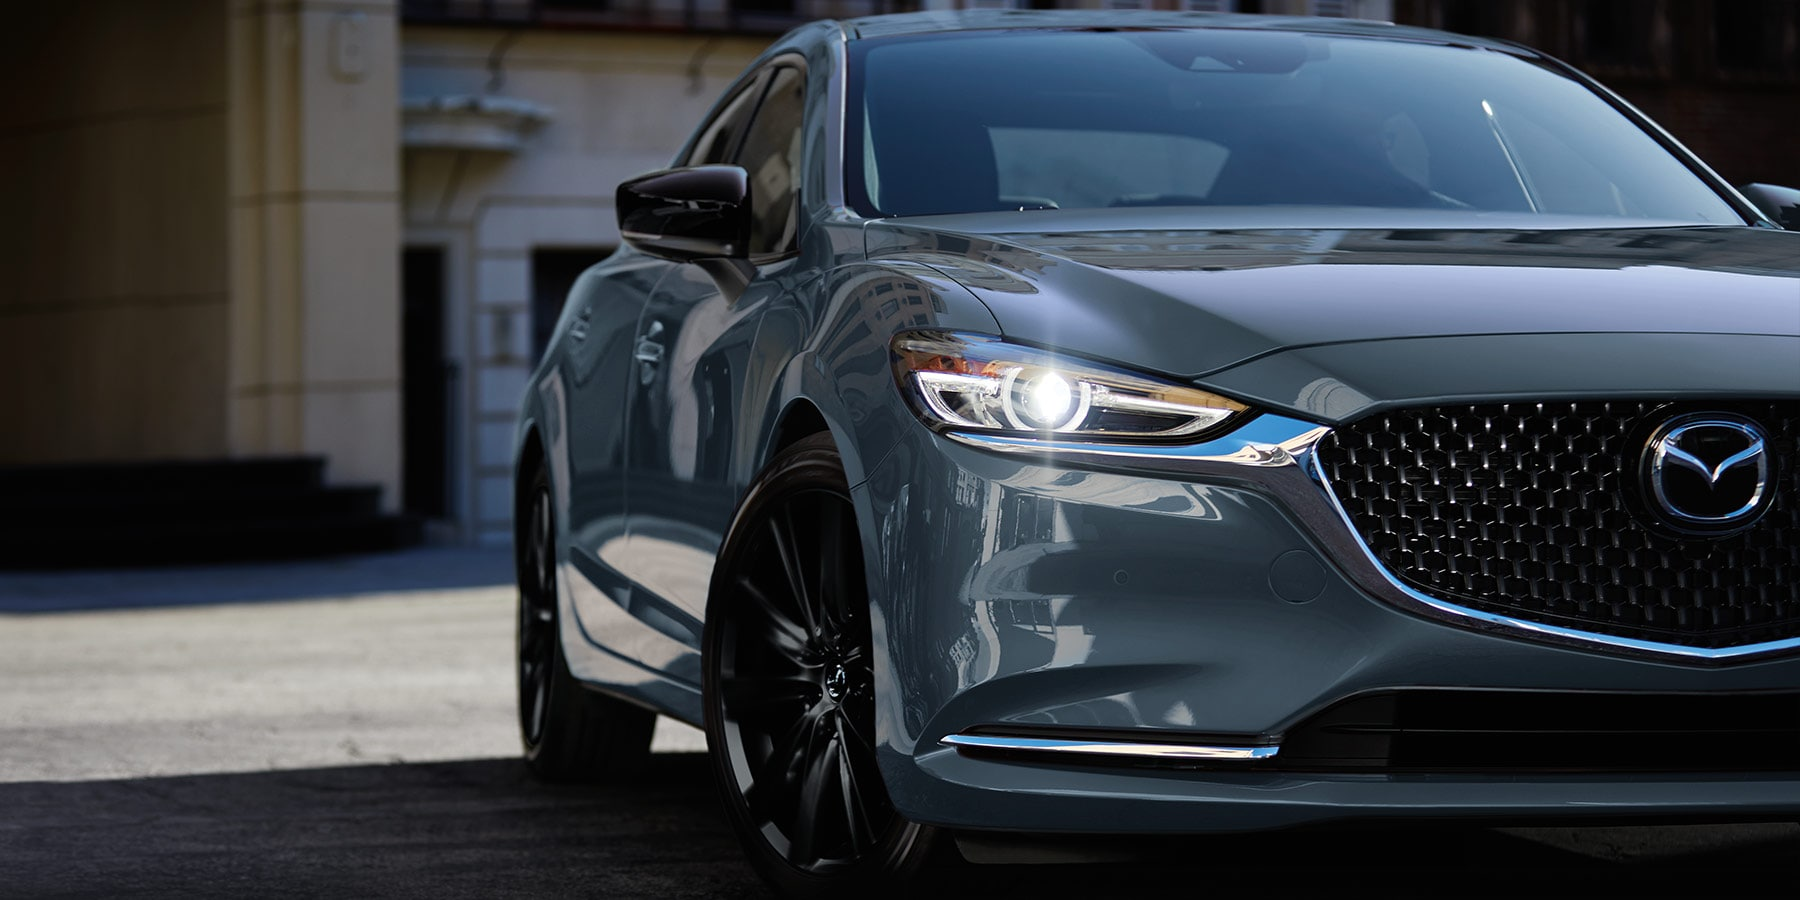 2021 Mazda 6 Carbon Edition NJ